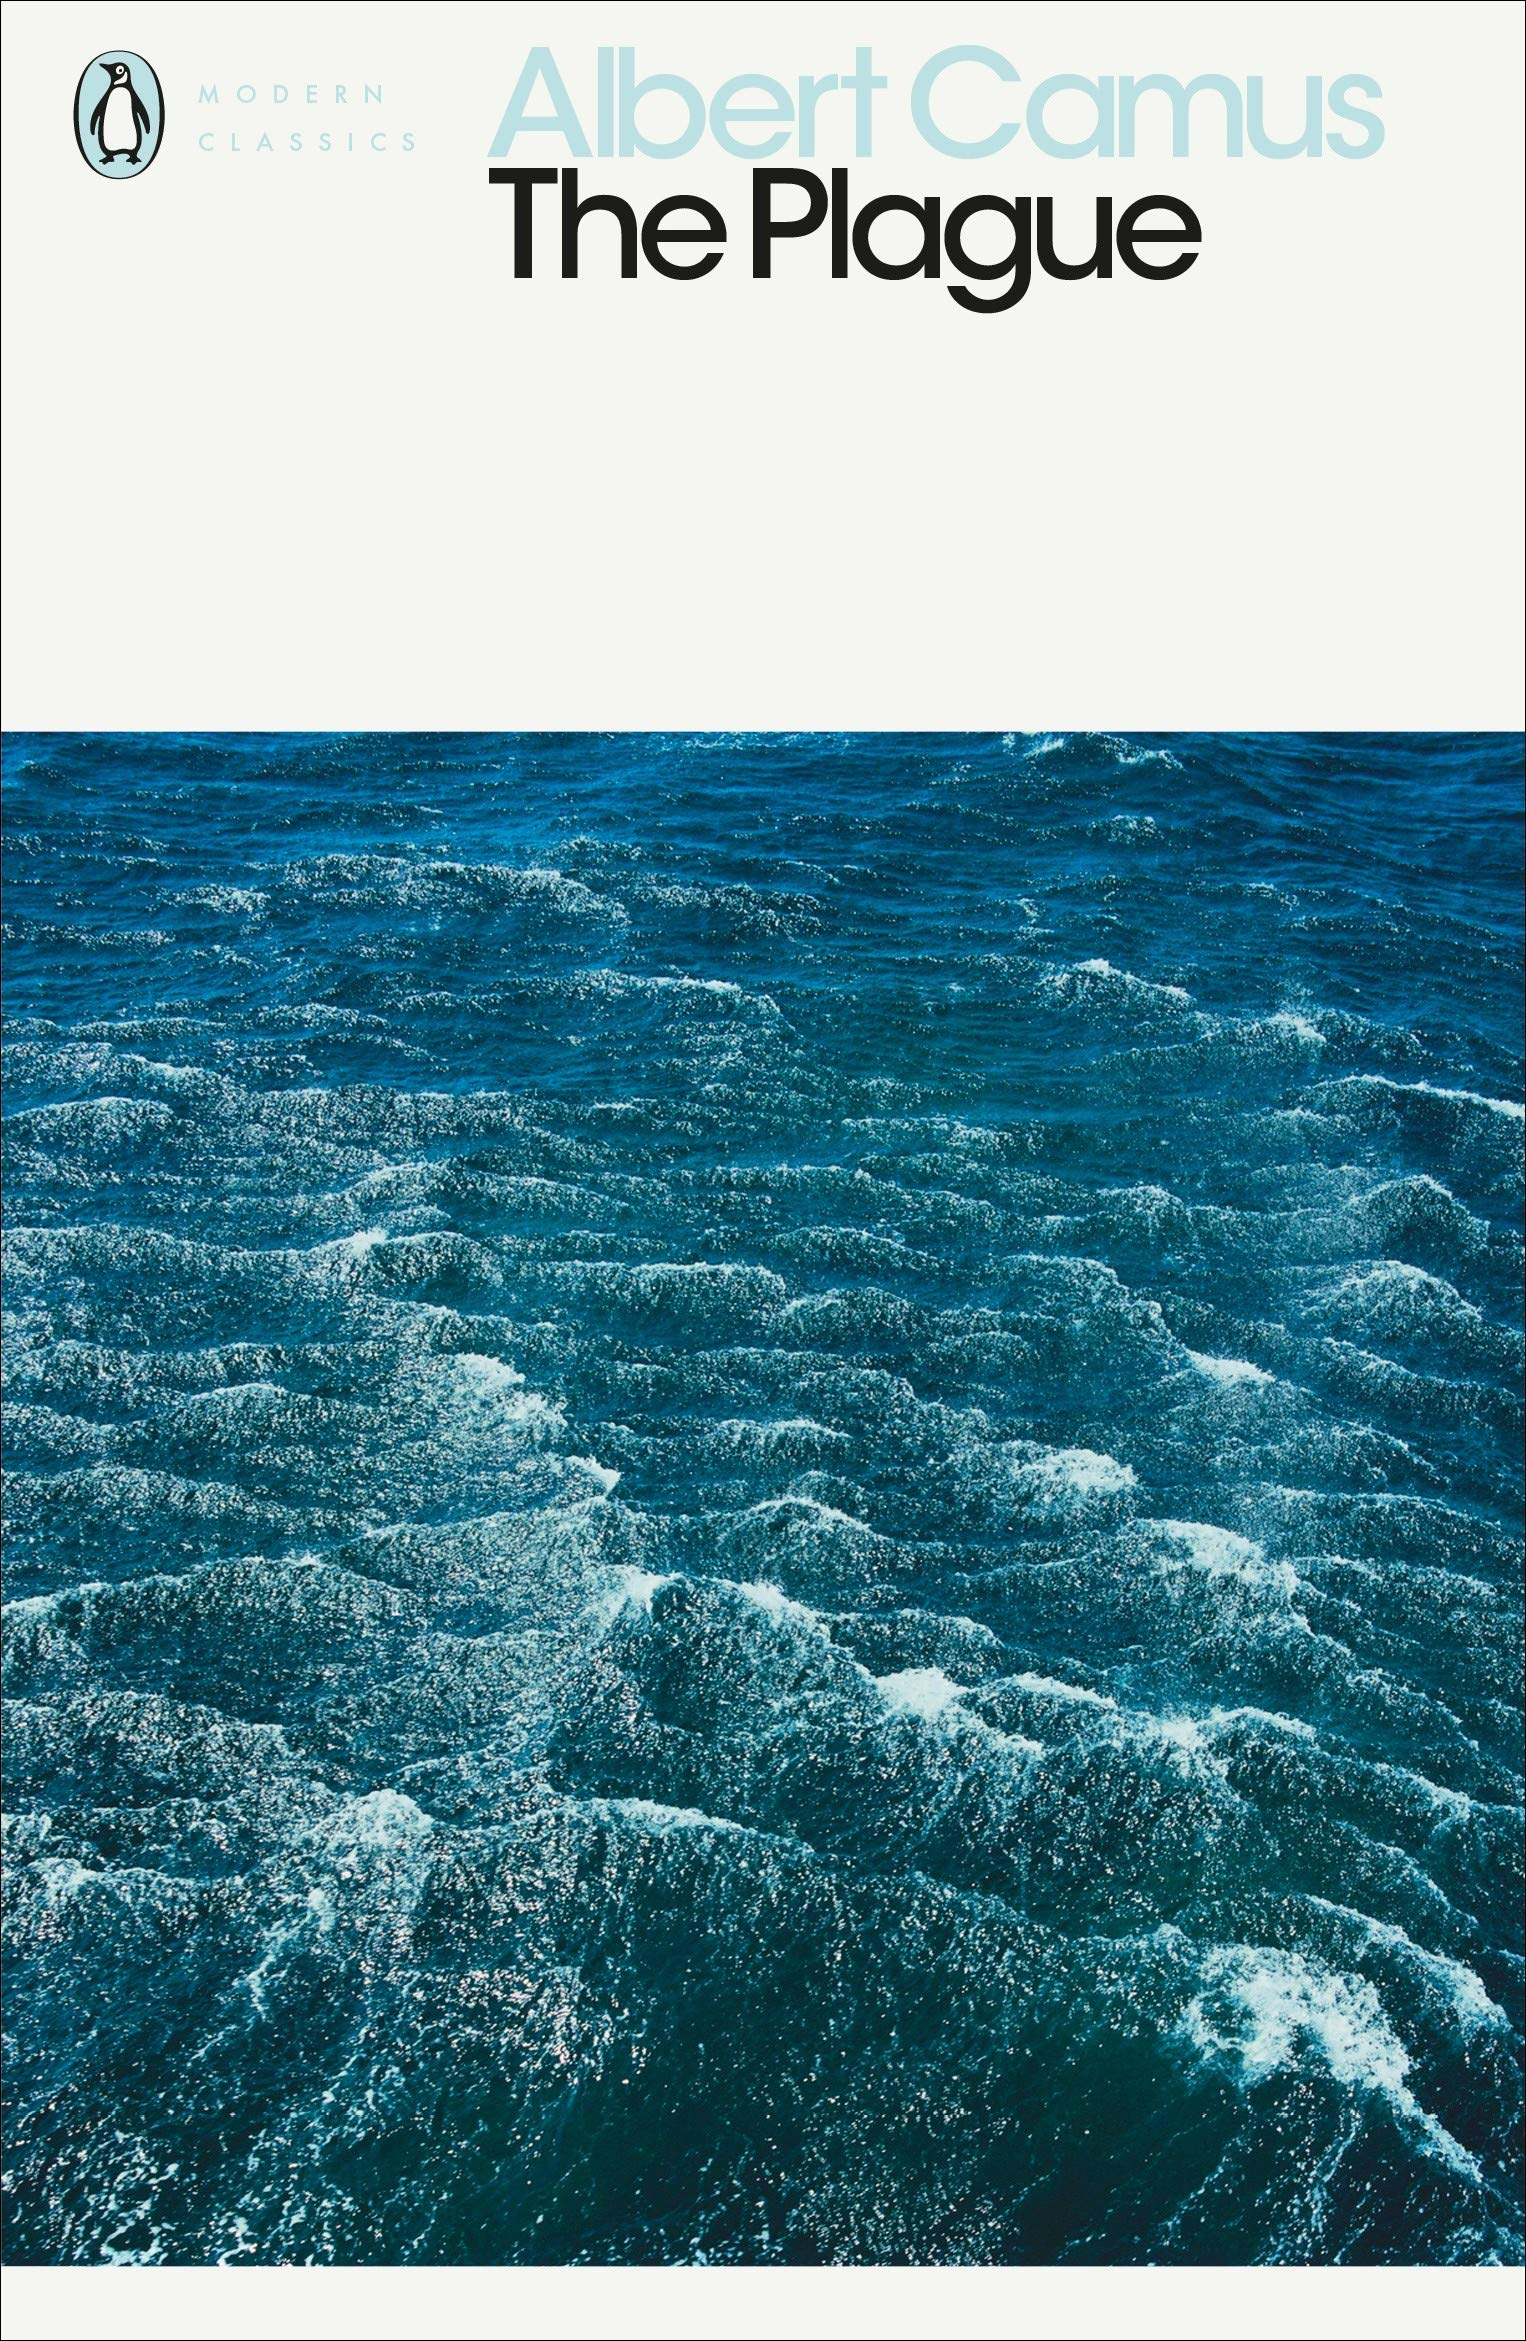 The Plague (Penguin Modern Classics): Amazon.co.uk: Camus, Albert, Judt,  Professor Tony, Buss, Robin: 9780141185132: Books